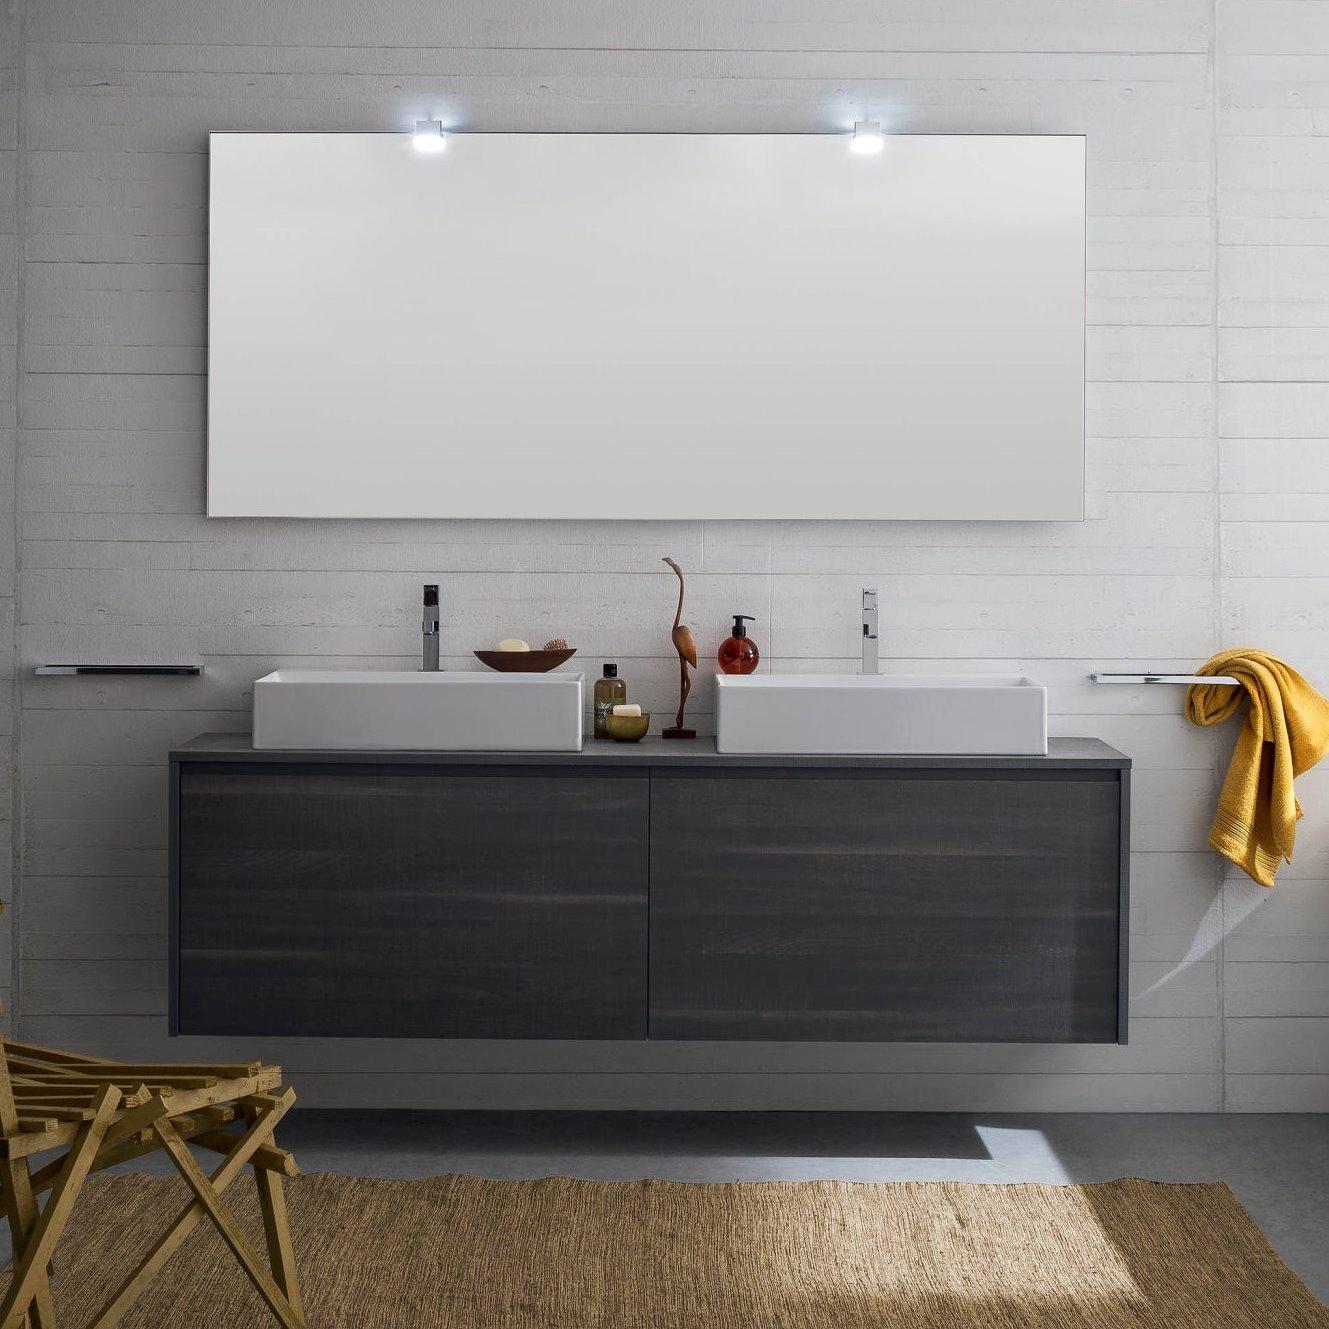 Mobile e lavabo bagno mobile bagno moderno pensili e base